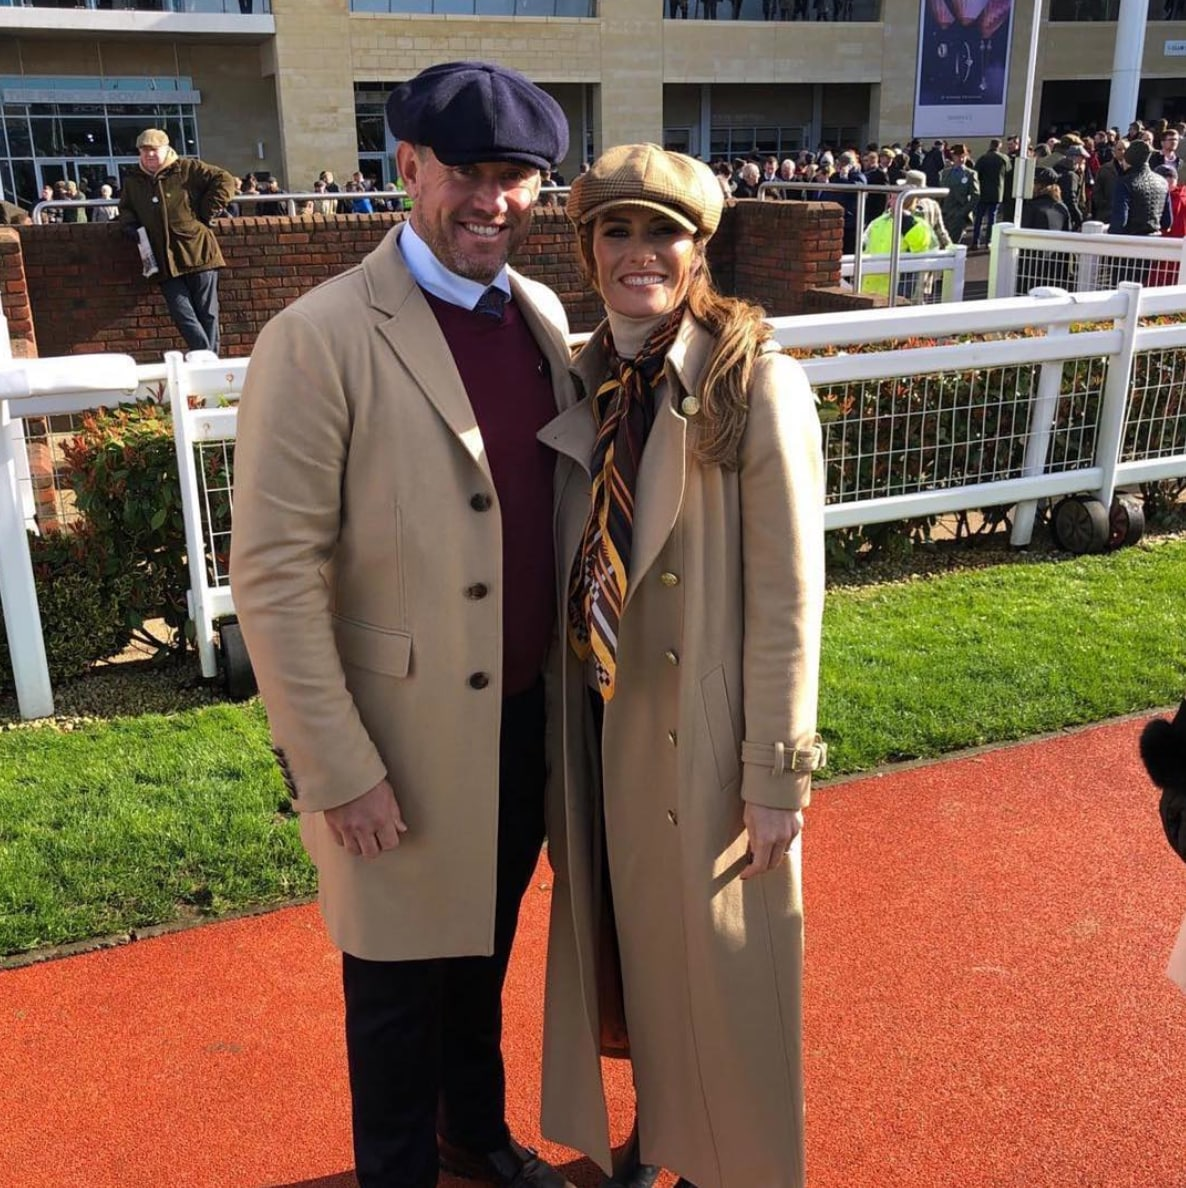 Lee Westwood and Helen Storey